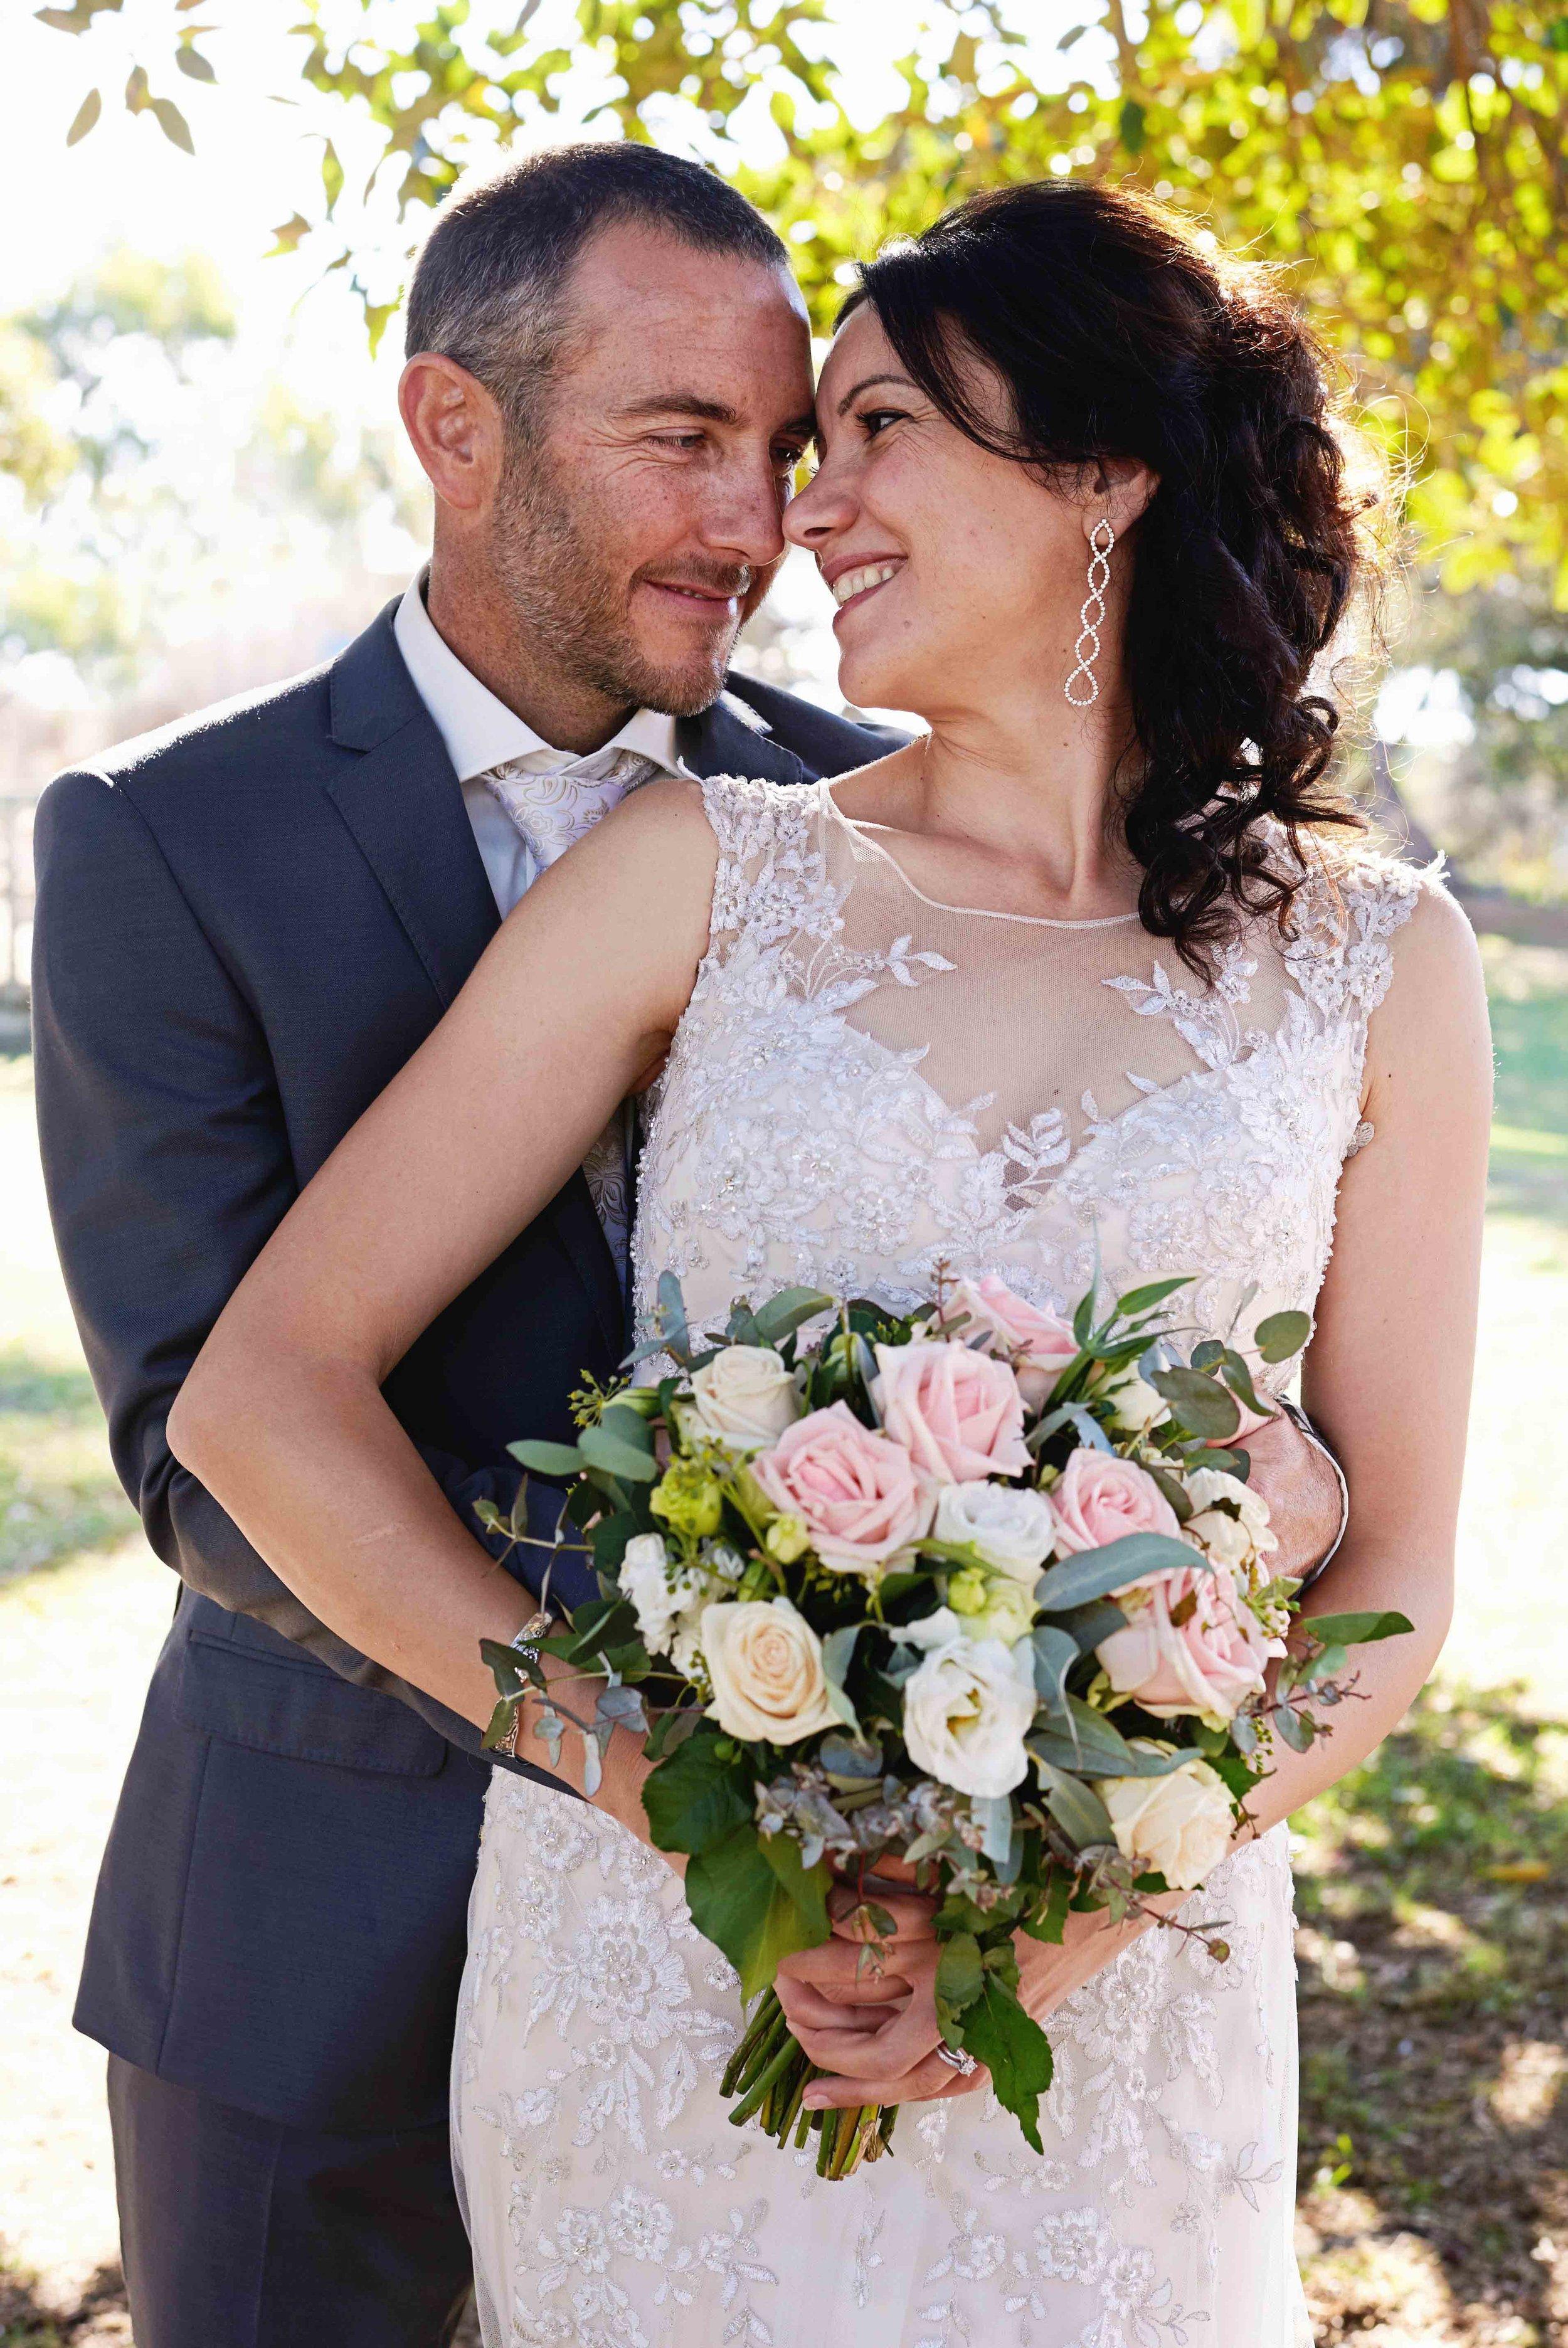 sorrento-wedding-photography-all-smiles-marissa-jade-photography-157.jpg